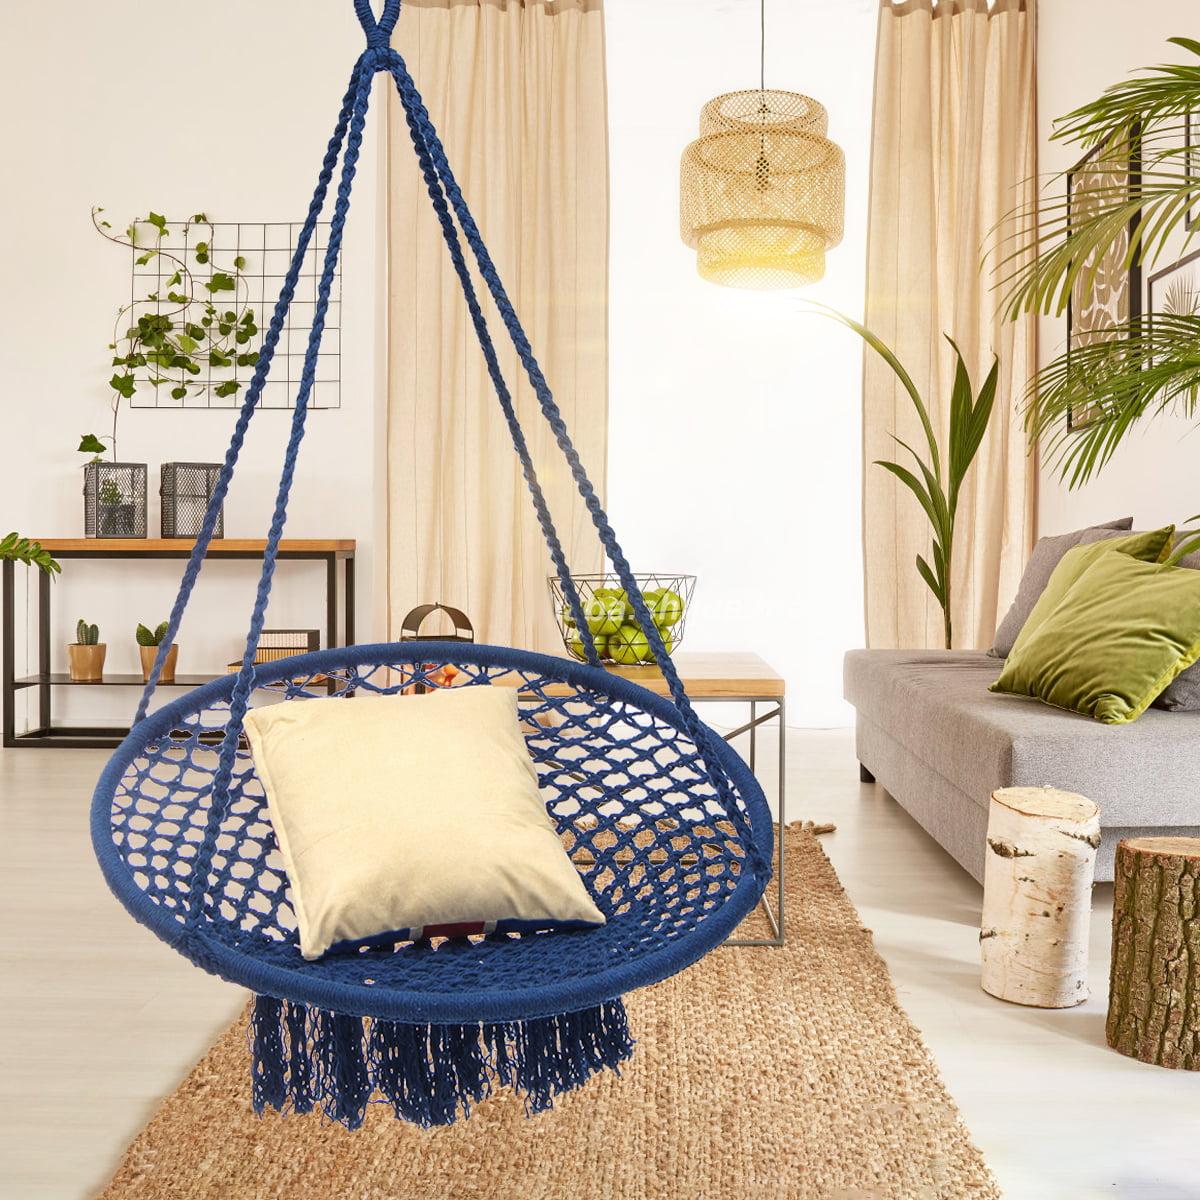 Hanging Hammock Mesh Cotton Nylon Rope Macrame Wooden Bar Chair Swing Outdoor Home Garden Patio Chair Seat Home Decor Christmas Gift